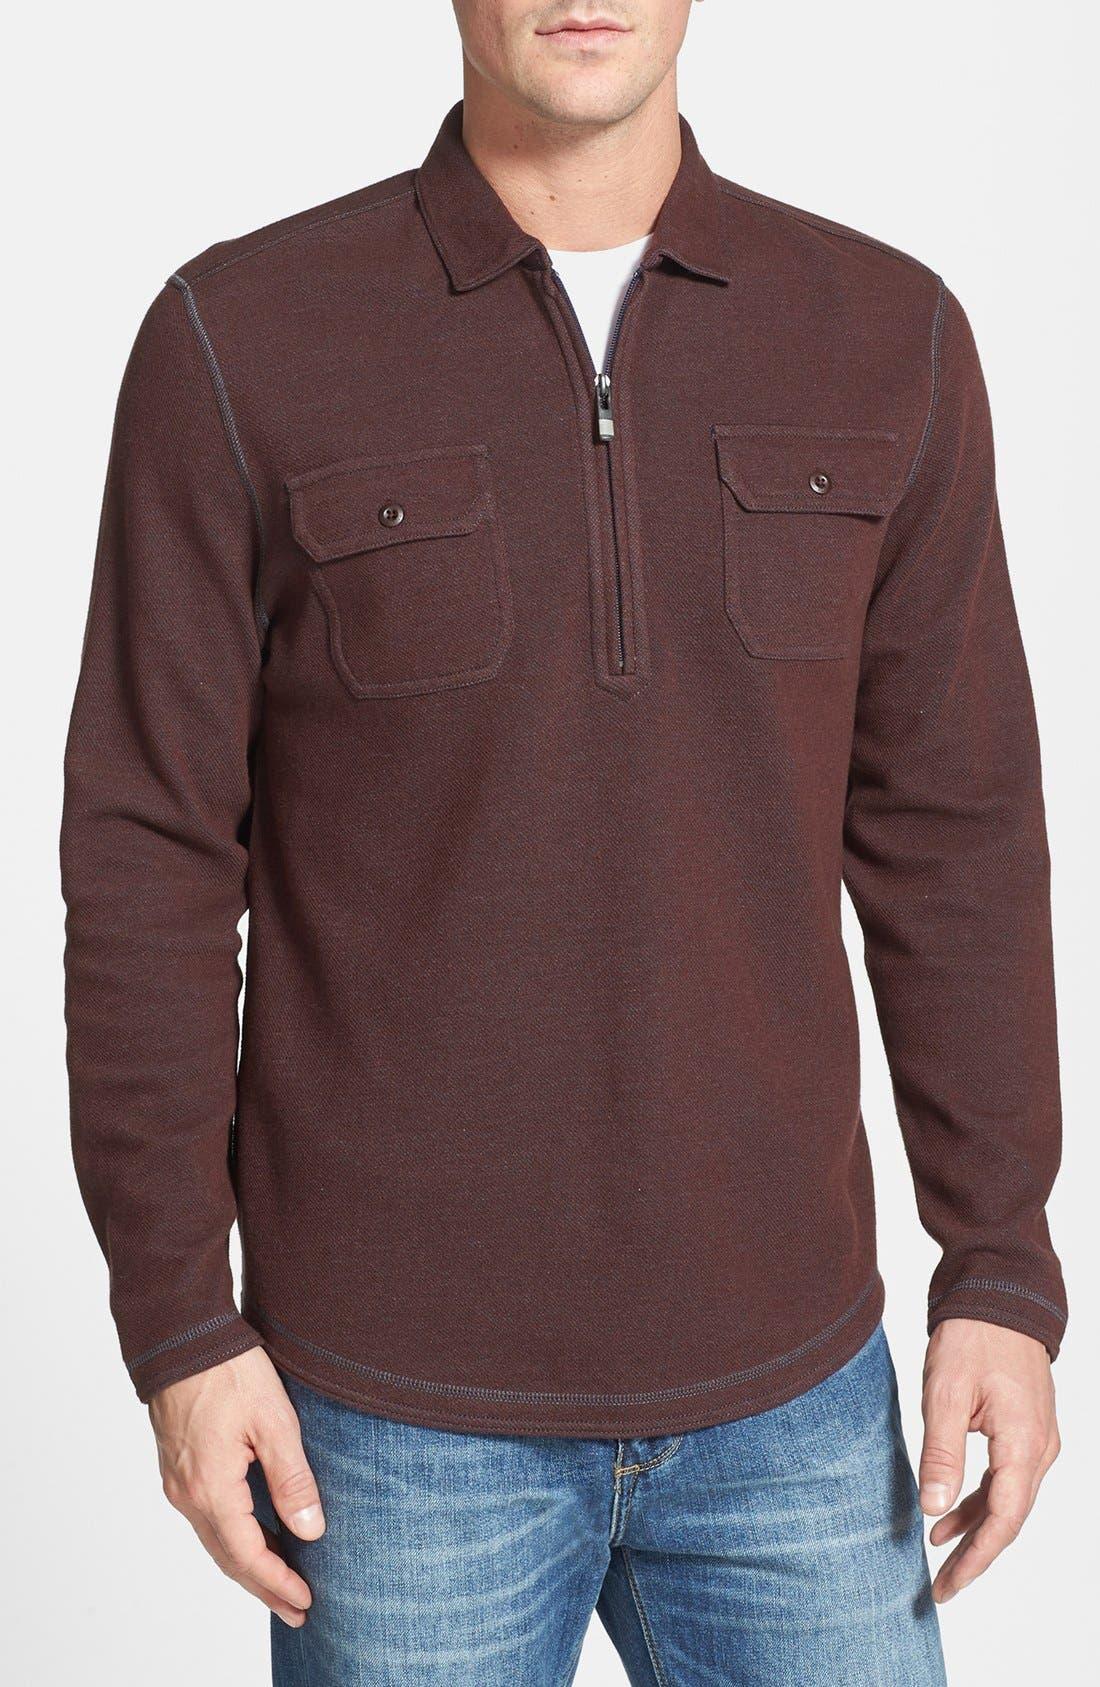 Main Image - Tommy Bahama Denim 'Bob Twillin' Island Modern Fit Half Zip Sweatshirt